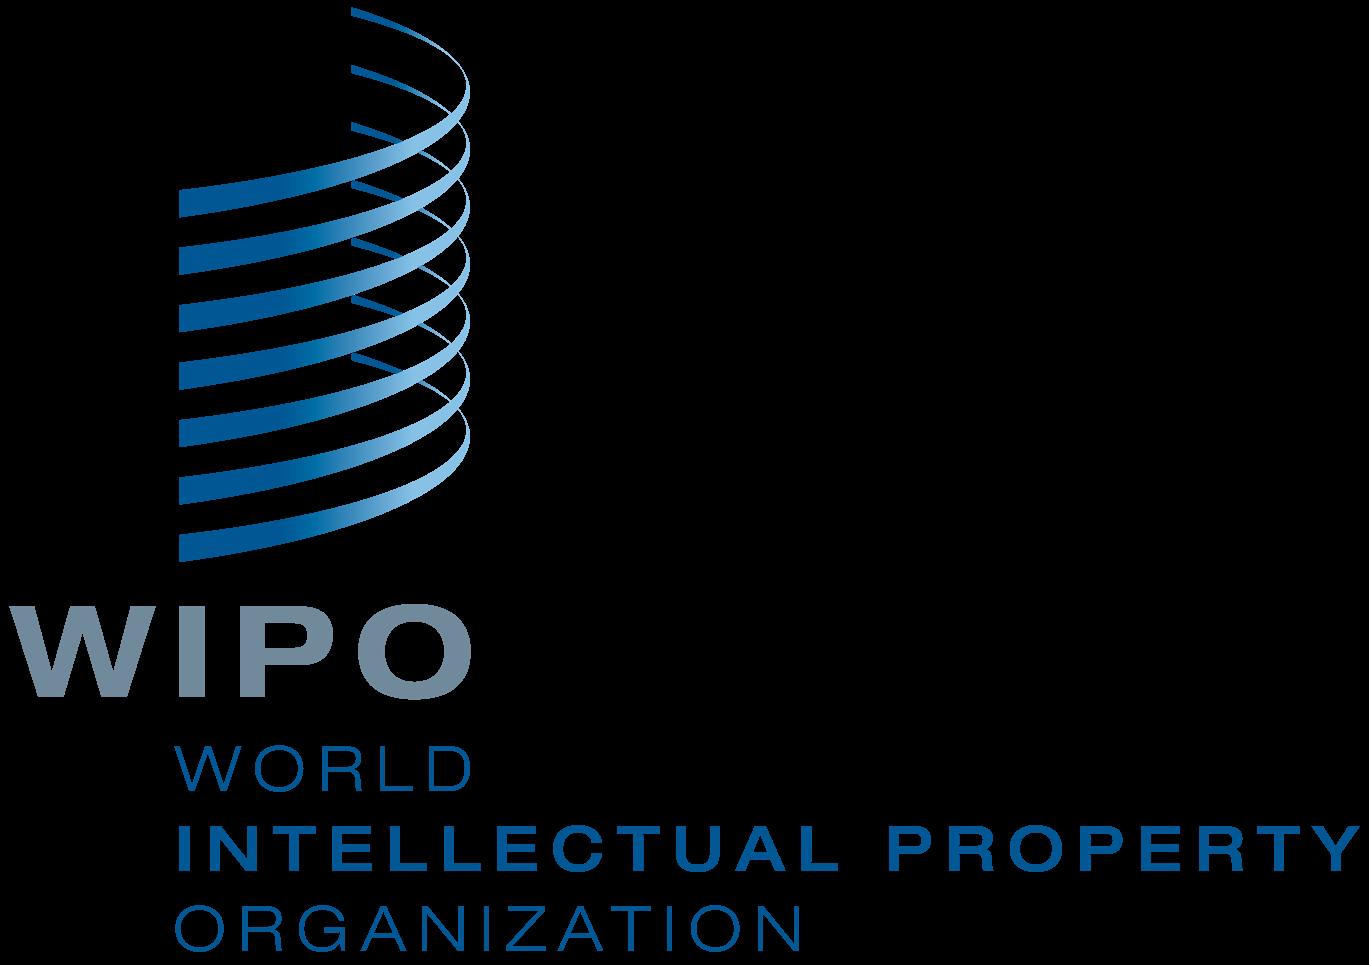 logo for World Intellectual Property Organization